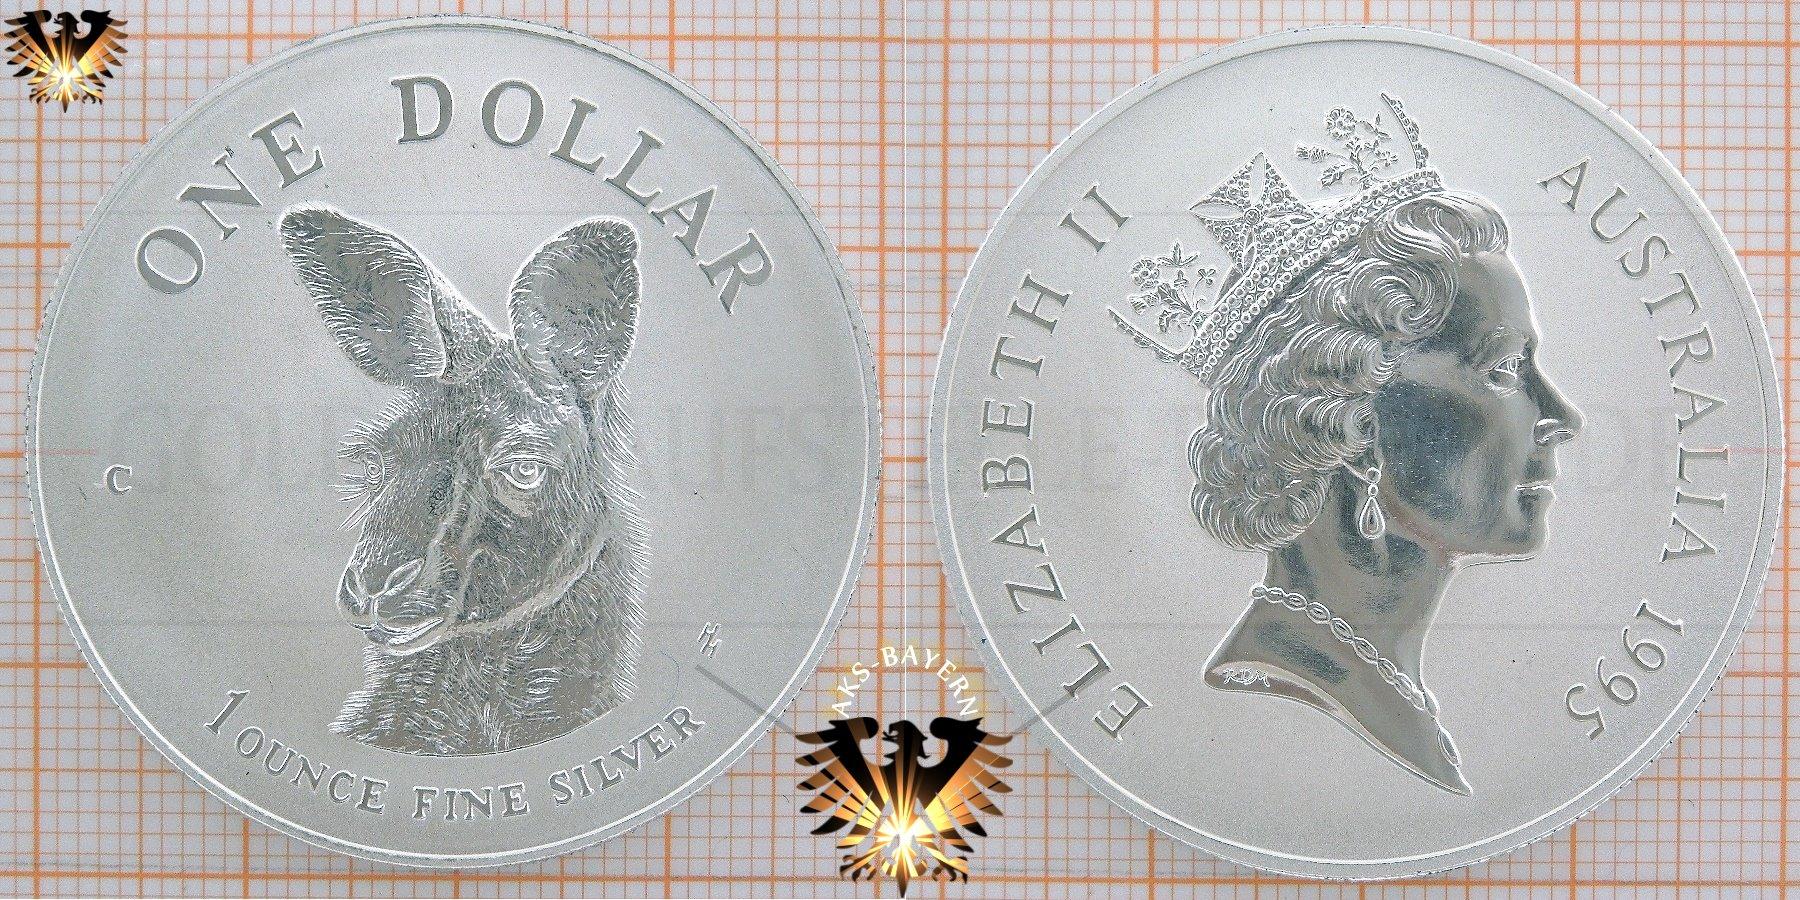 1 Dollar 1995 Australian 180 S Fine Silver Kangaroo 1 Ounce